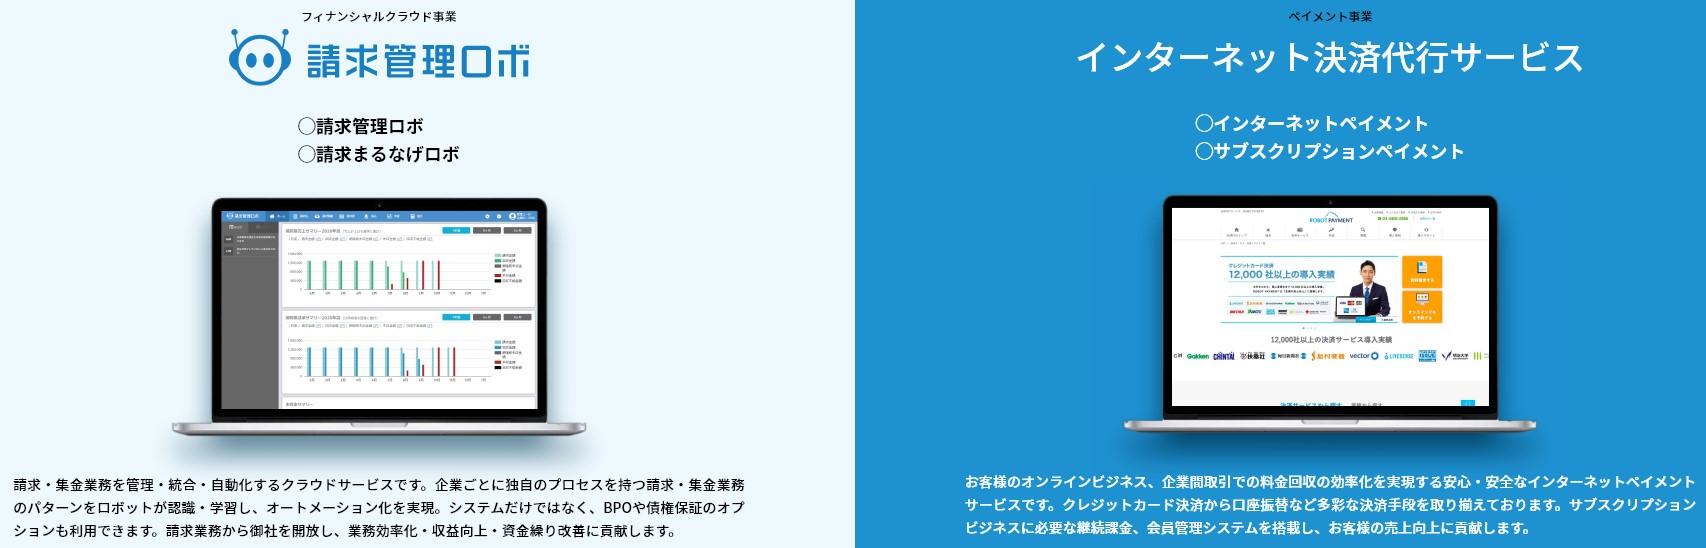 ROBOT PAYMENT(4374)IPOサービス内容